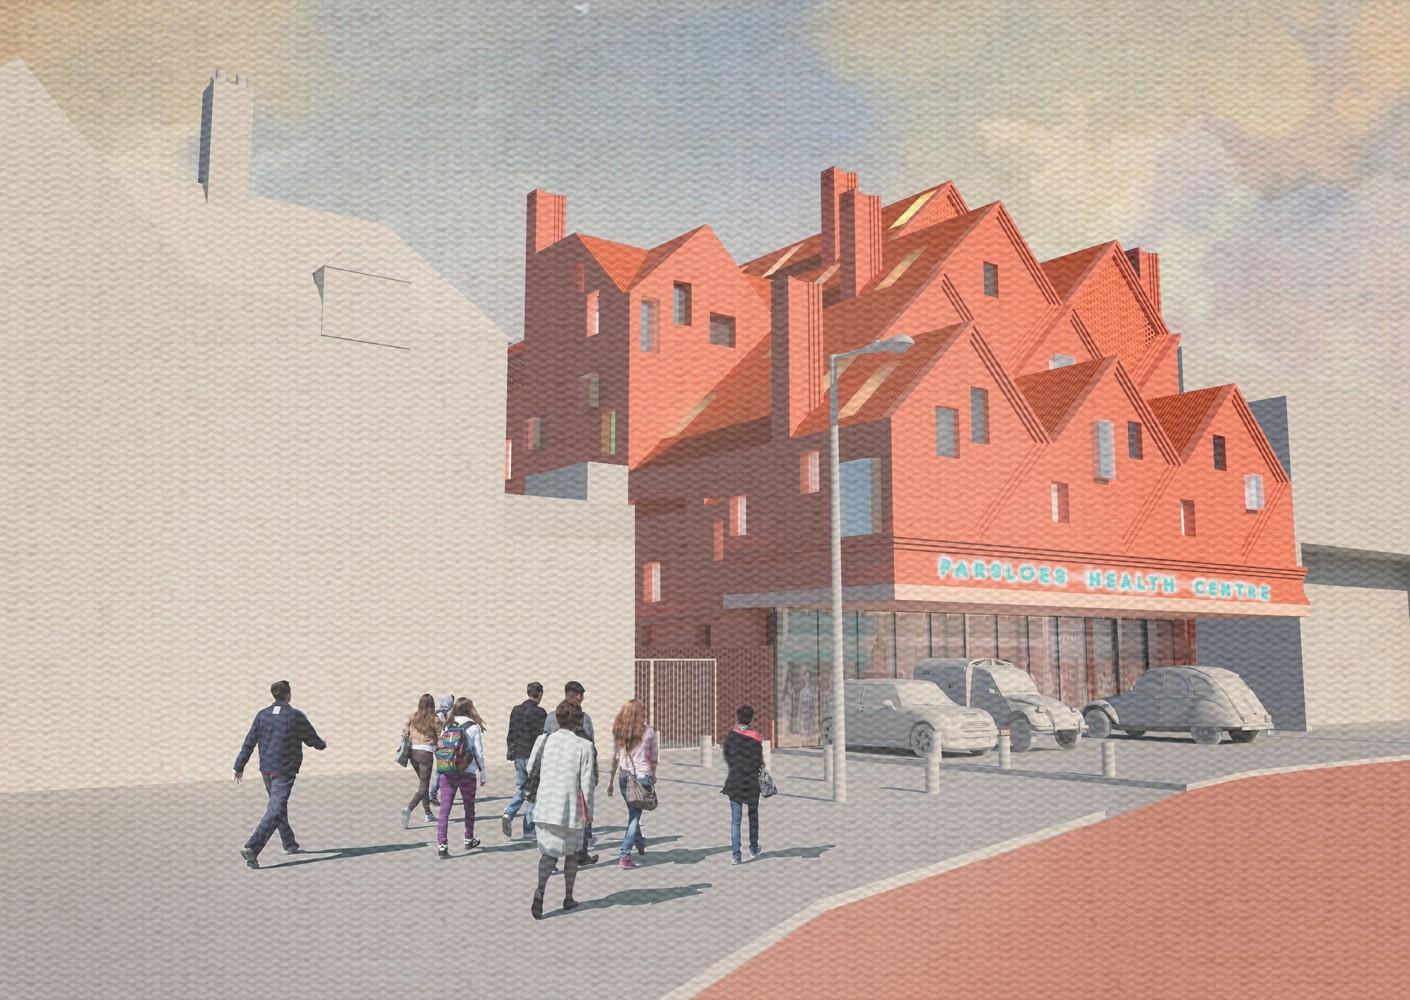 SOUTH LEFT peter morris architects